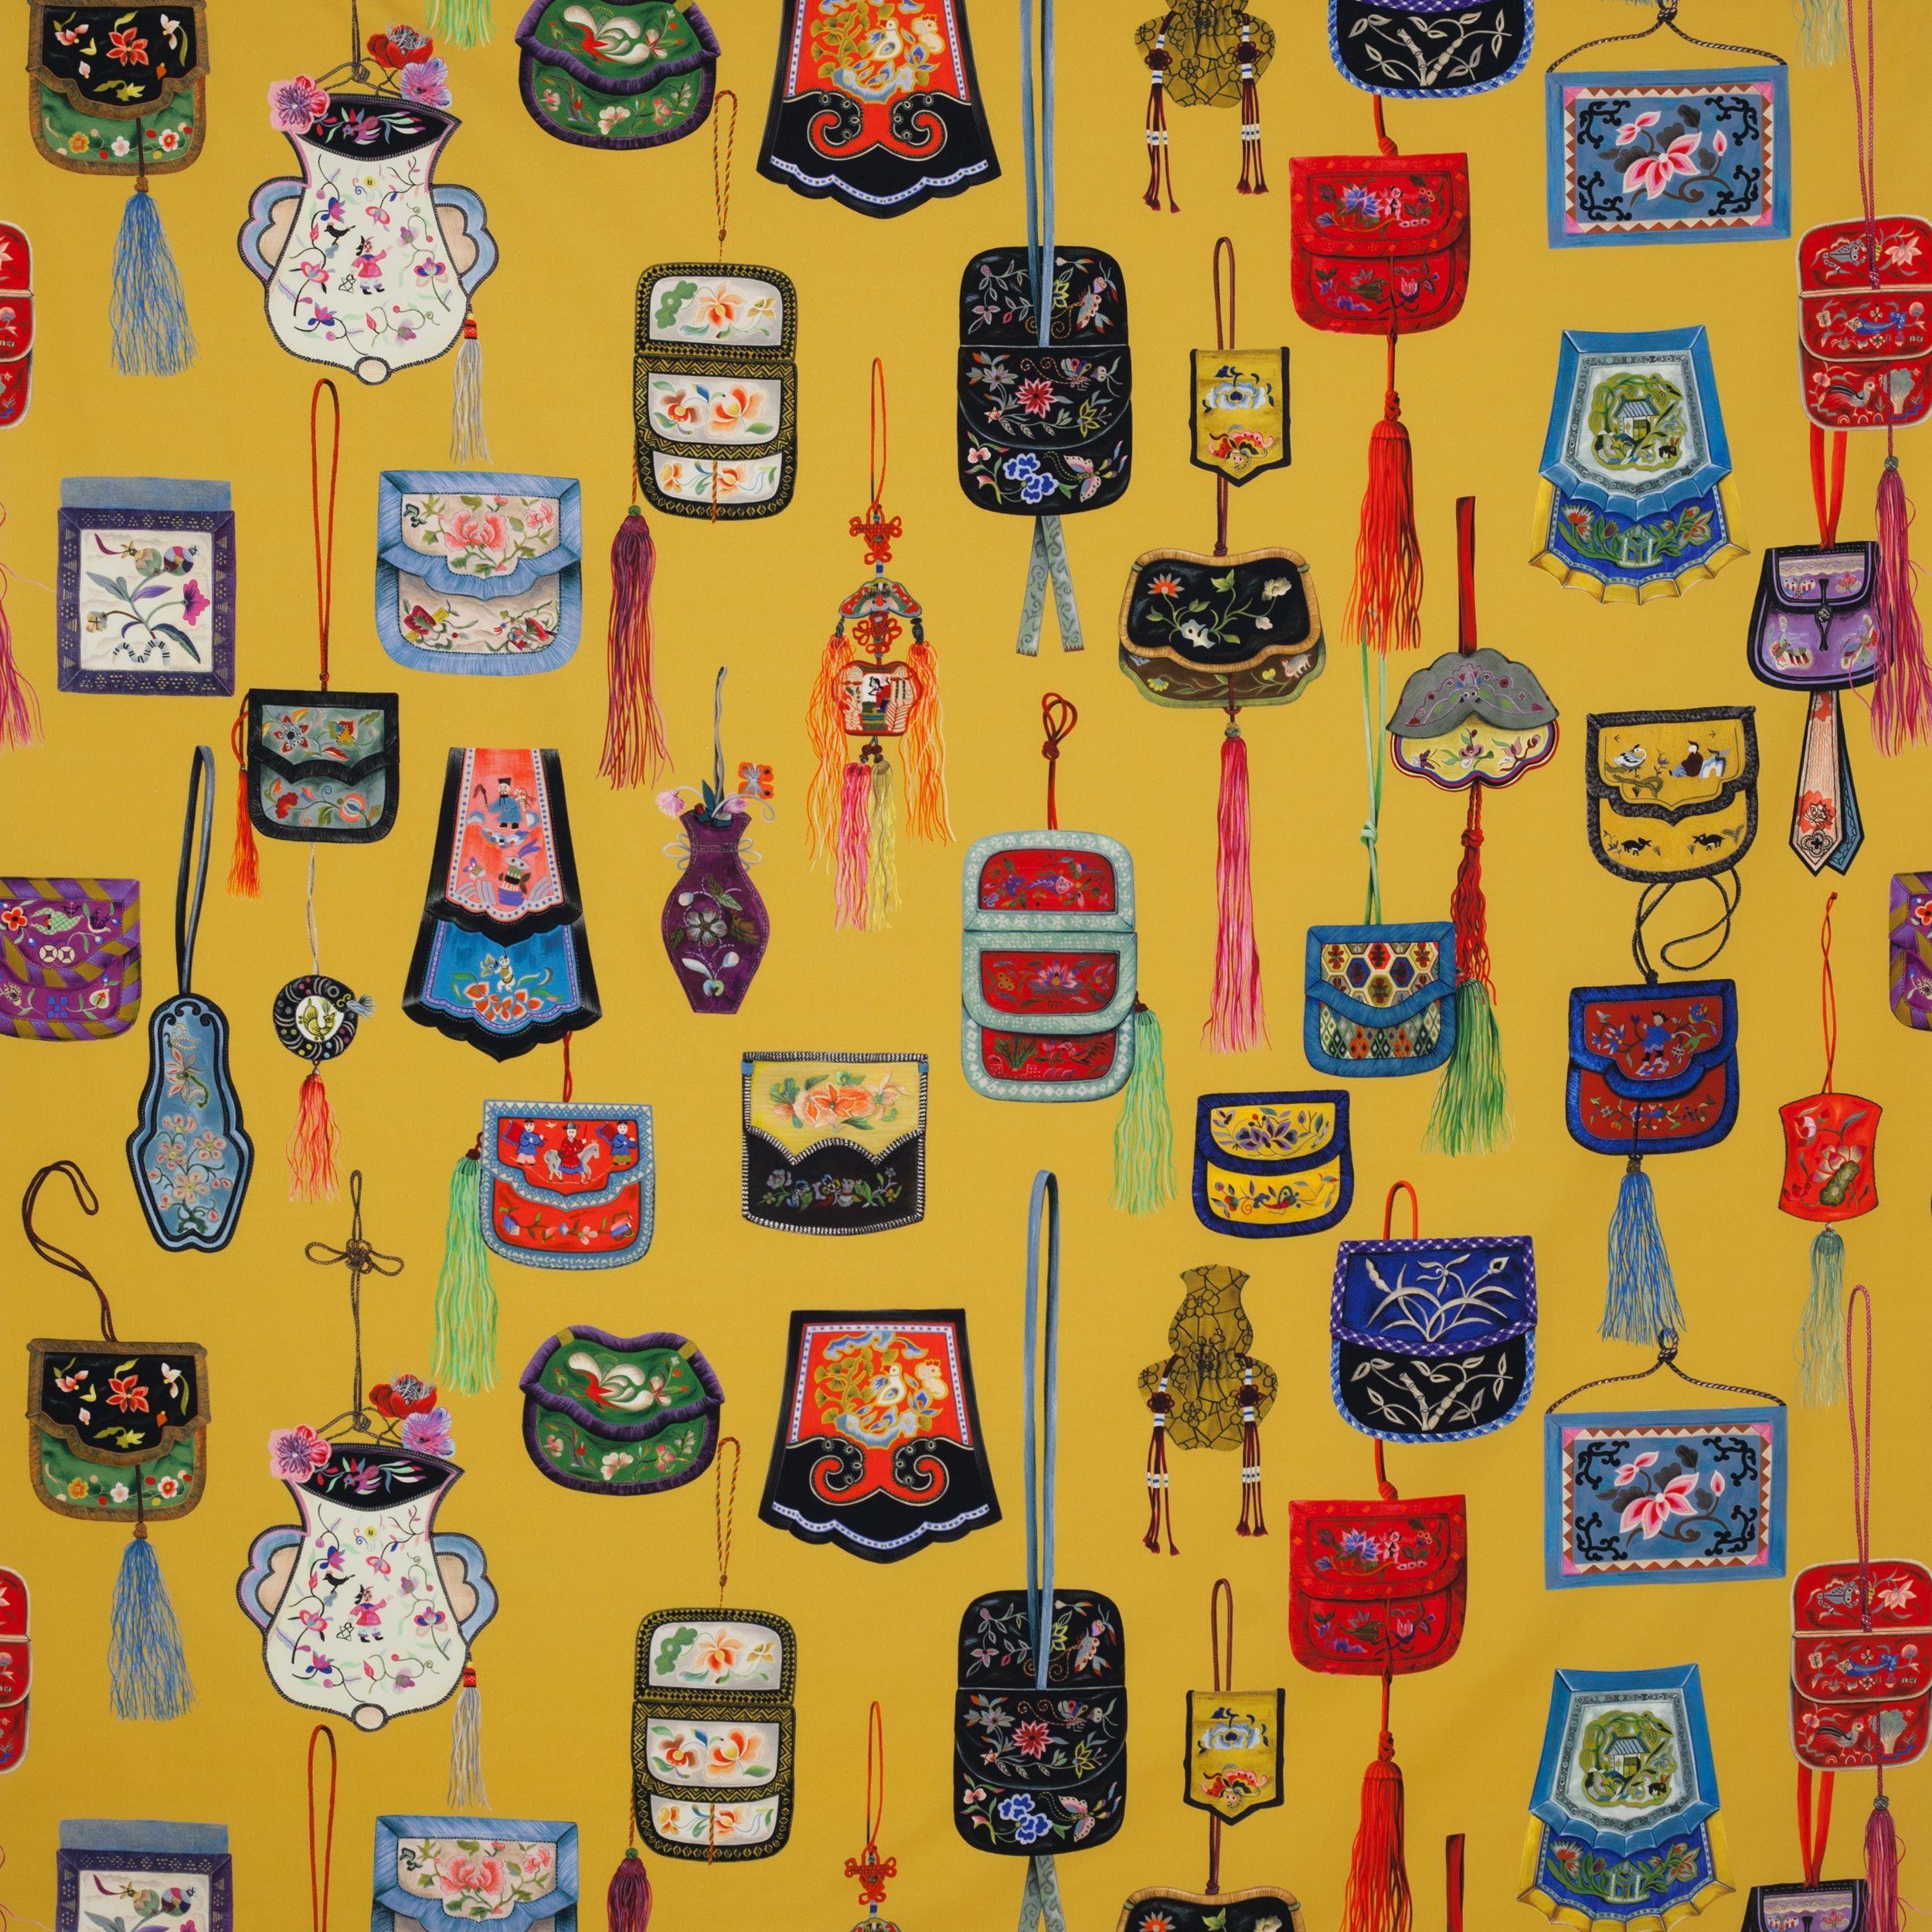 Manuel Canovas Miao Wallpaper Wallpaper And Wall Art Pinterest  # Muebles Kautiva